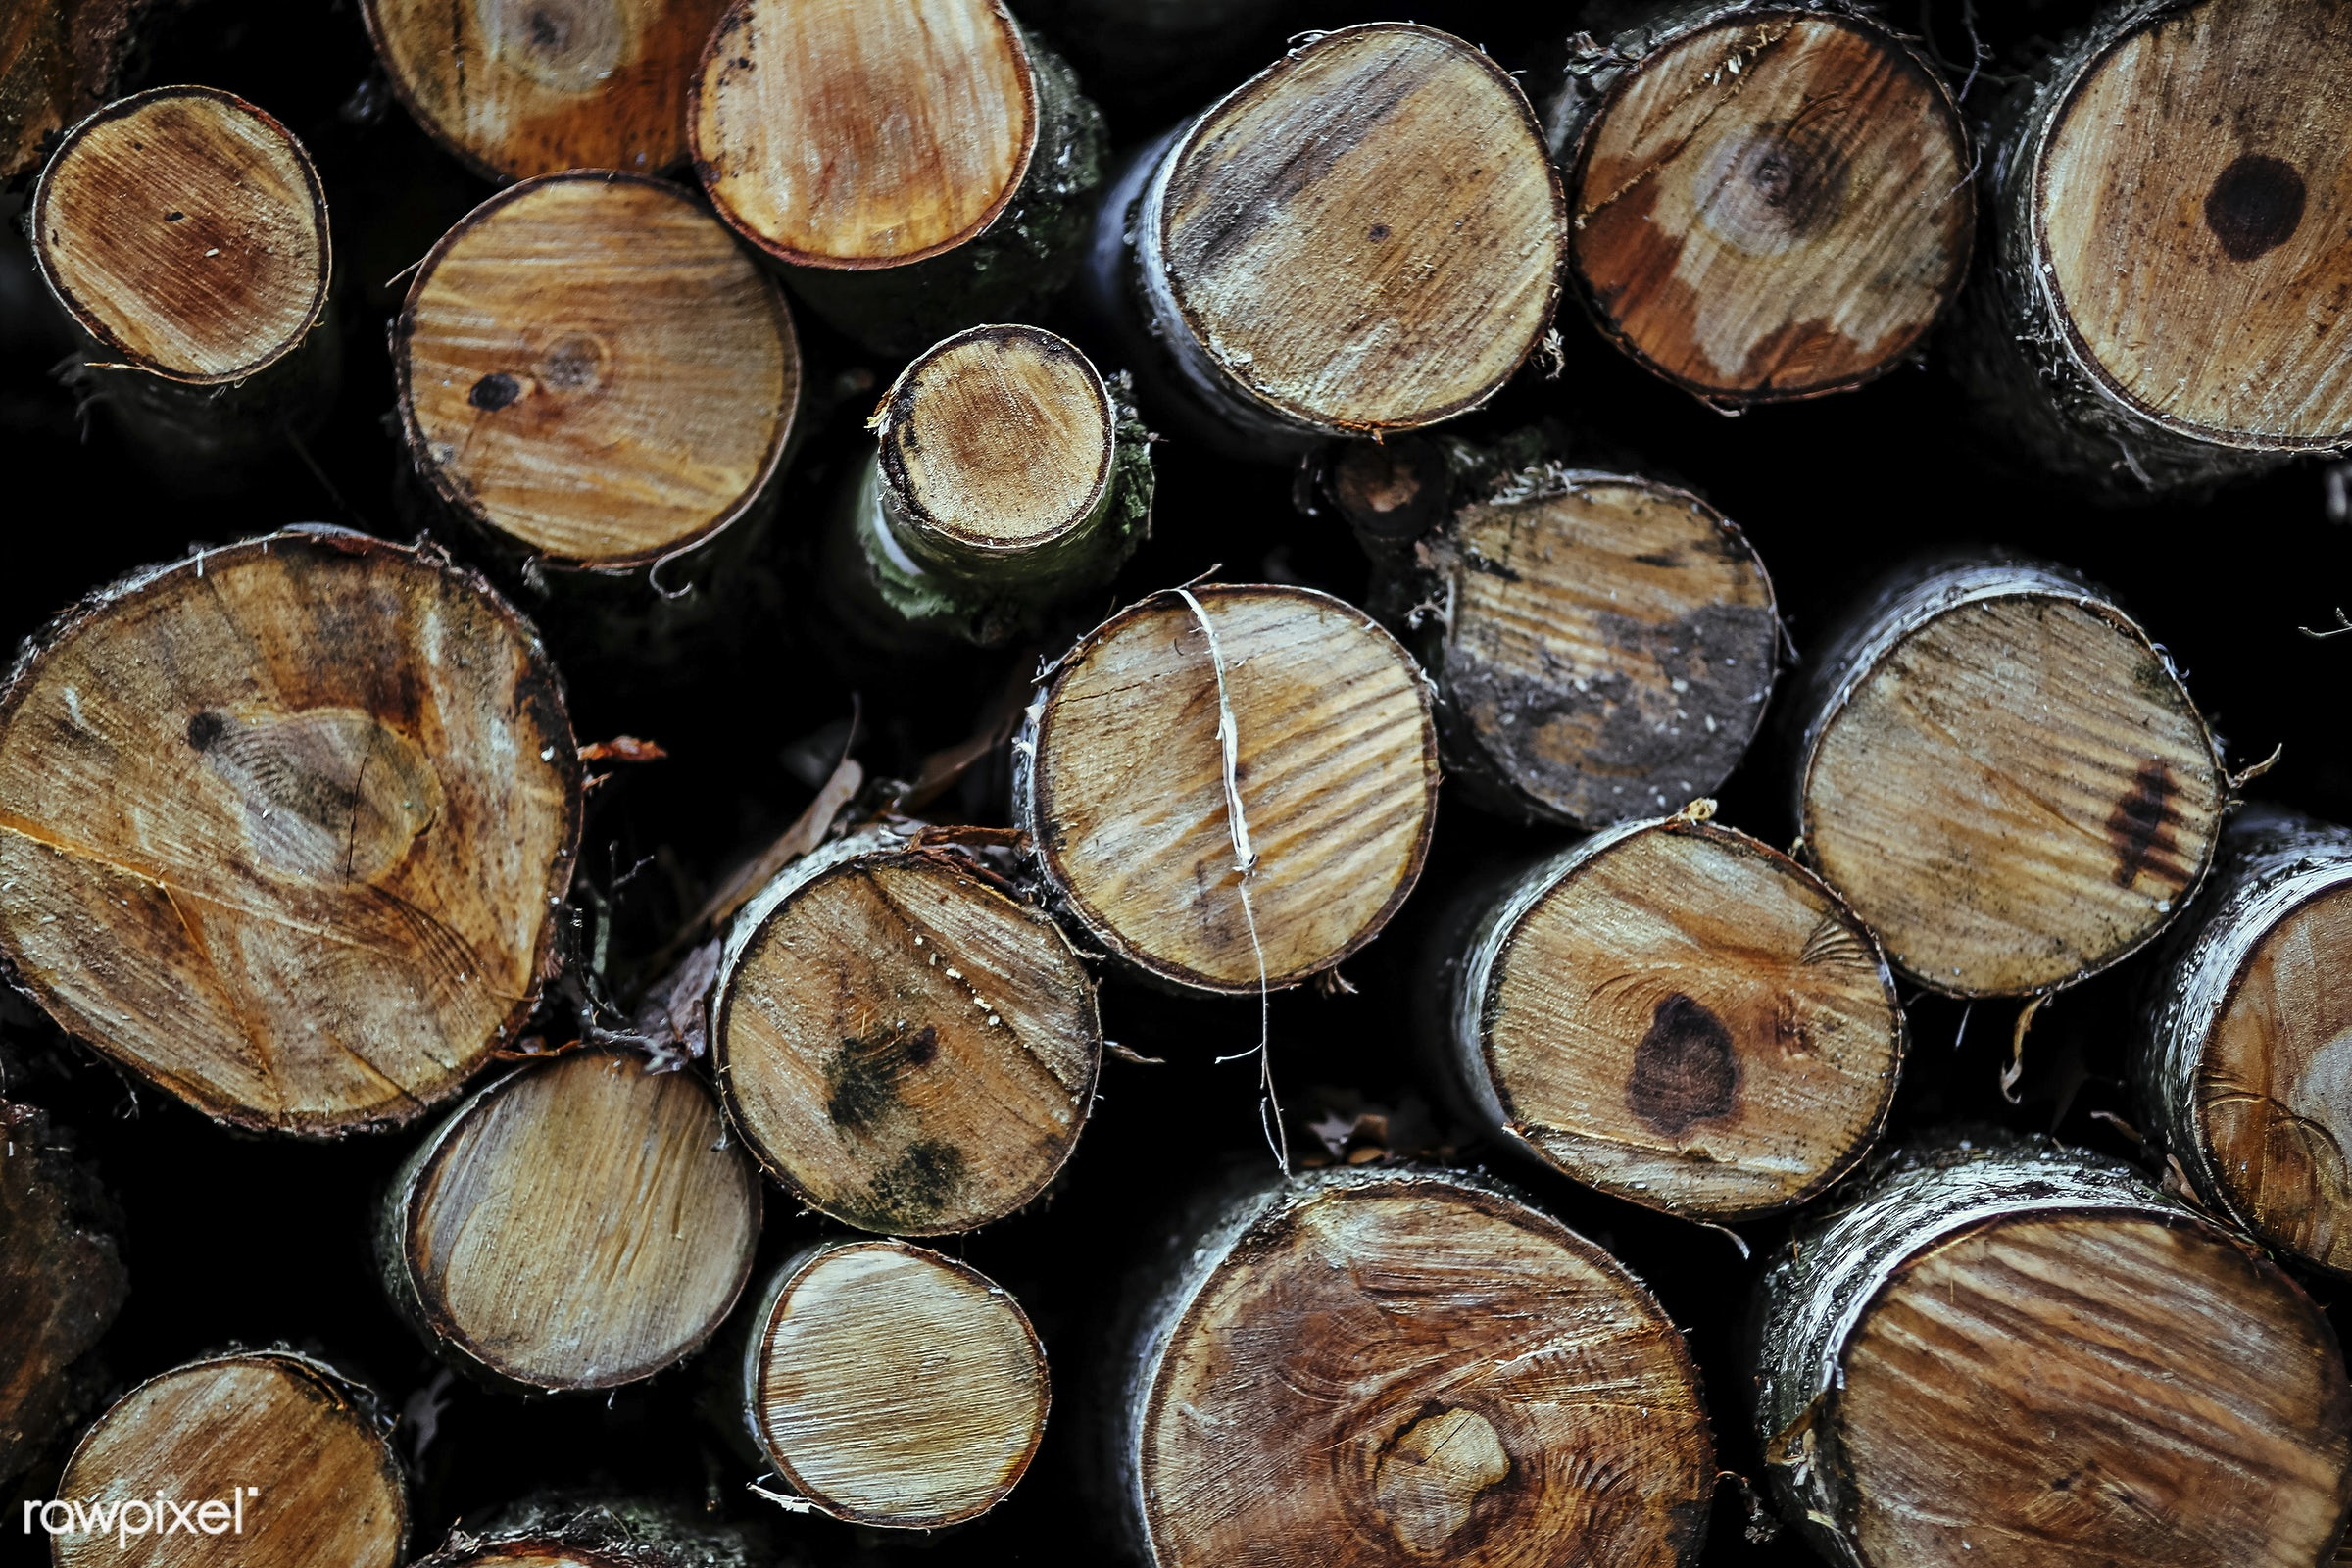 Close up of cut logs - autumn, brown, carpentry, close up, cut, deforestation, forest, logs, lumber, nature, outdoor, stump...